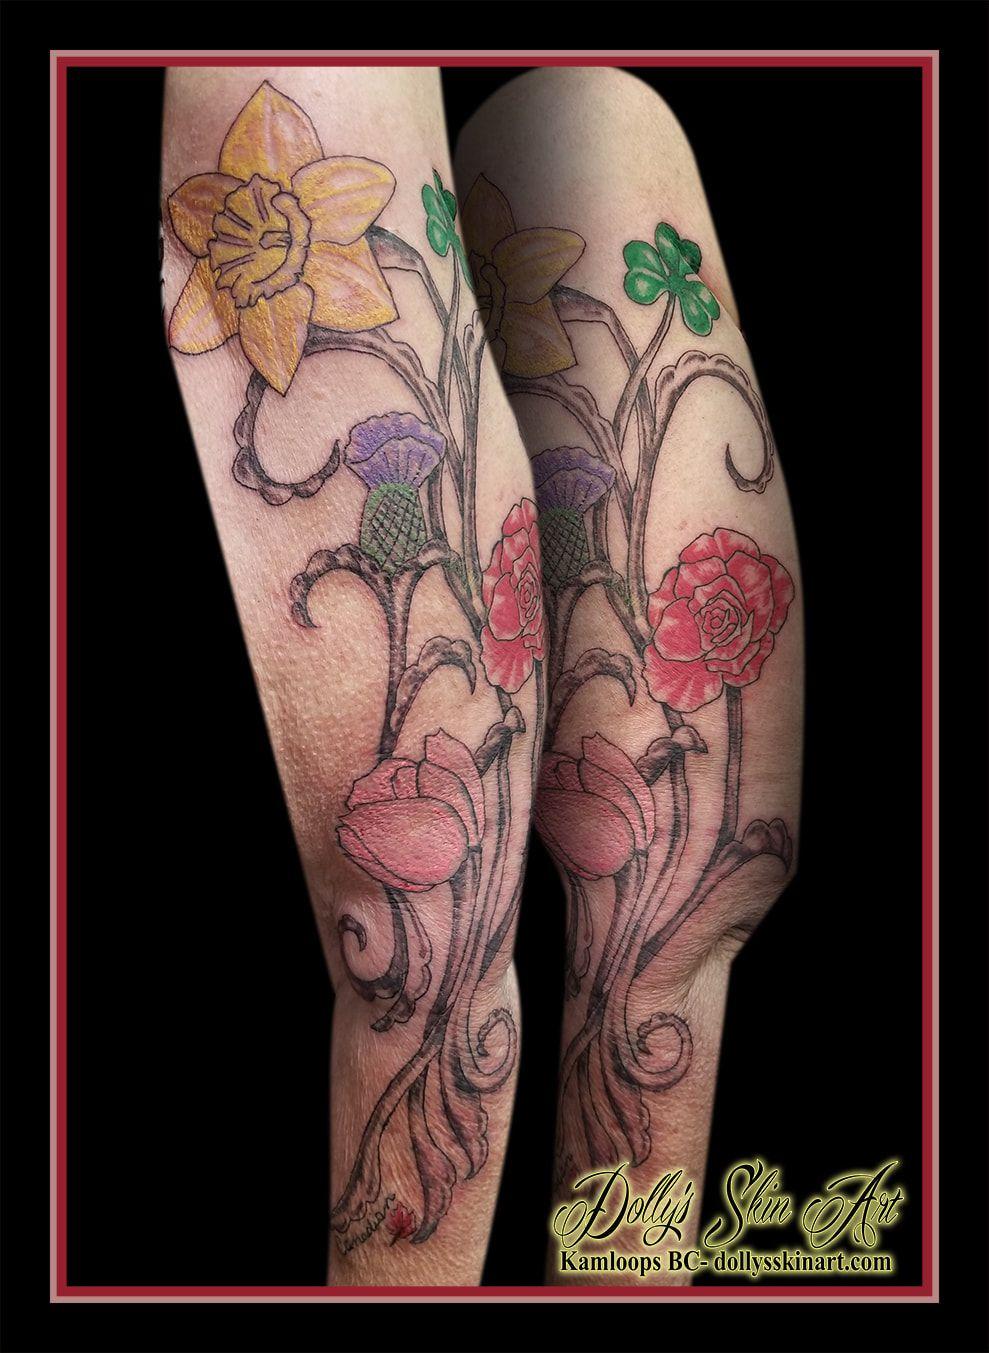 542d2f300 ireland shamrock england tudor rose scotland scottish thistle wales  daffodil holland tulip canada maple leaf colour